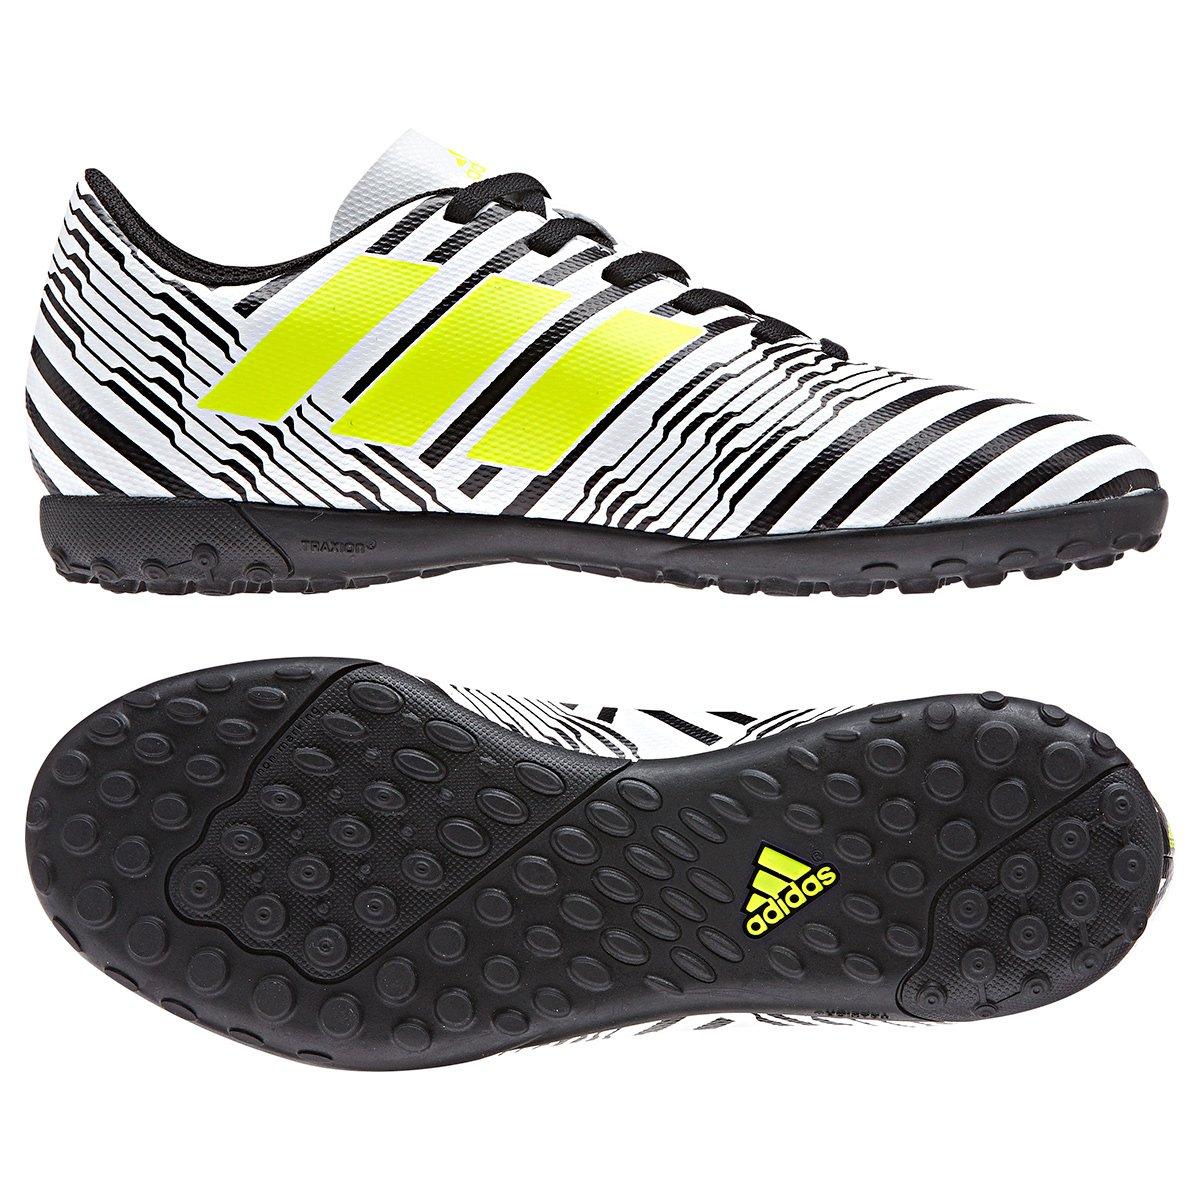 Chuteira Society Infantil Adidas Nemeziz 17.4 TF - Compre Agora ... c4aca434baa57